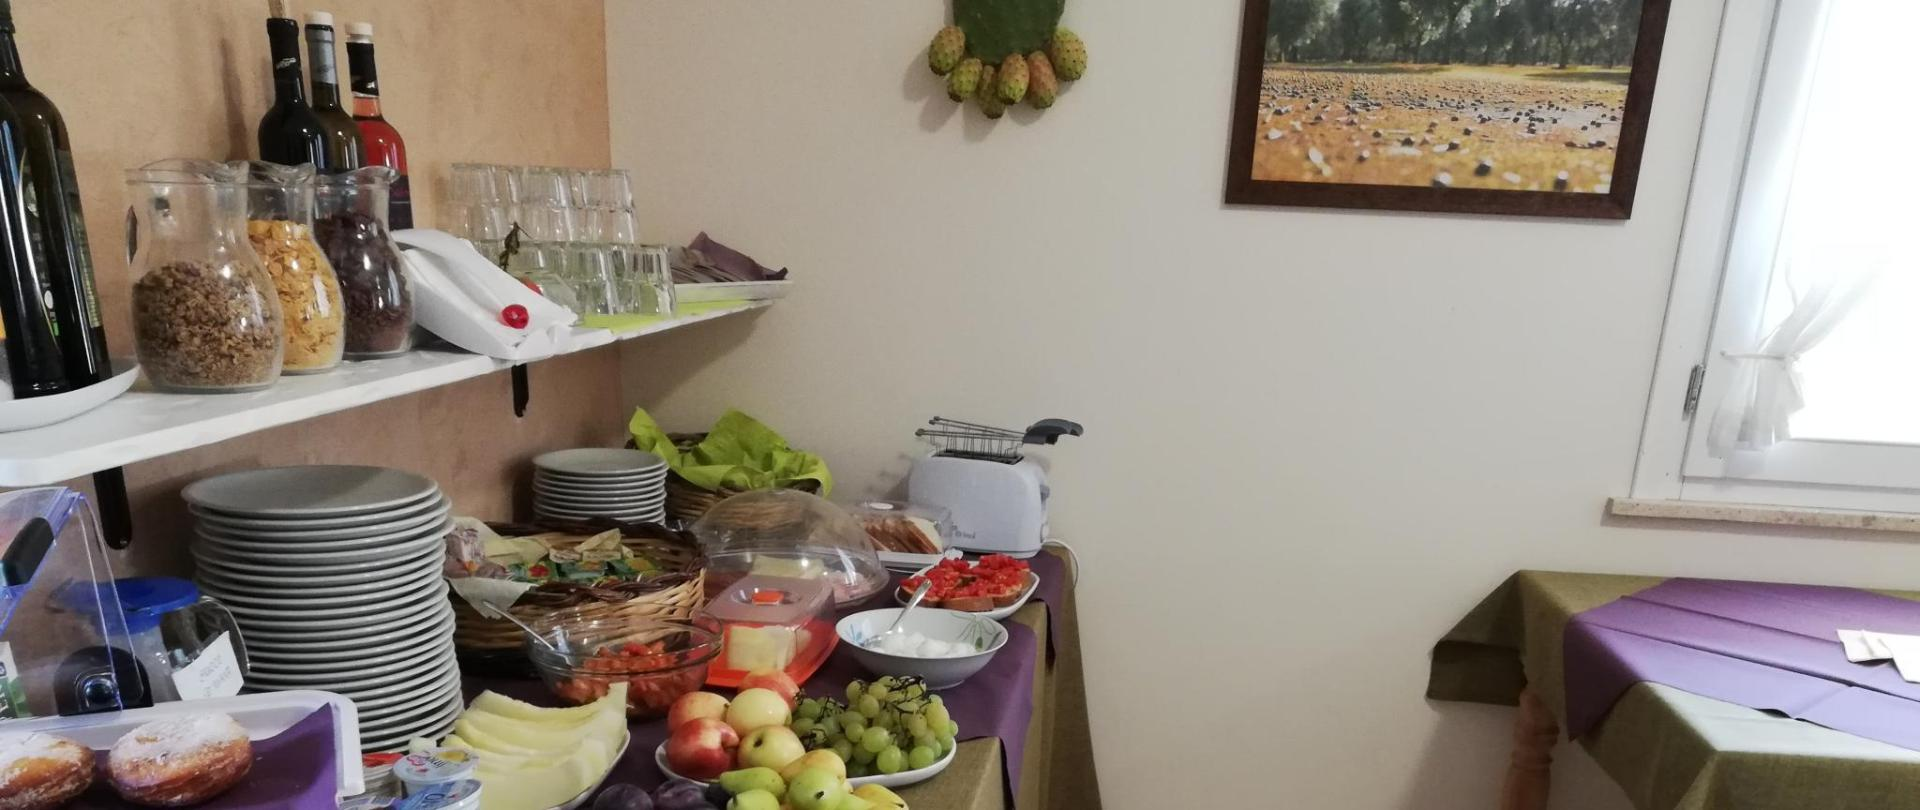 6 buffet colazione (3).jpg